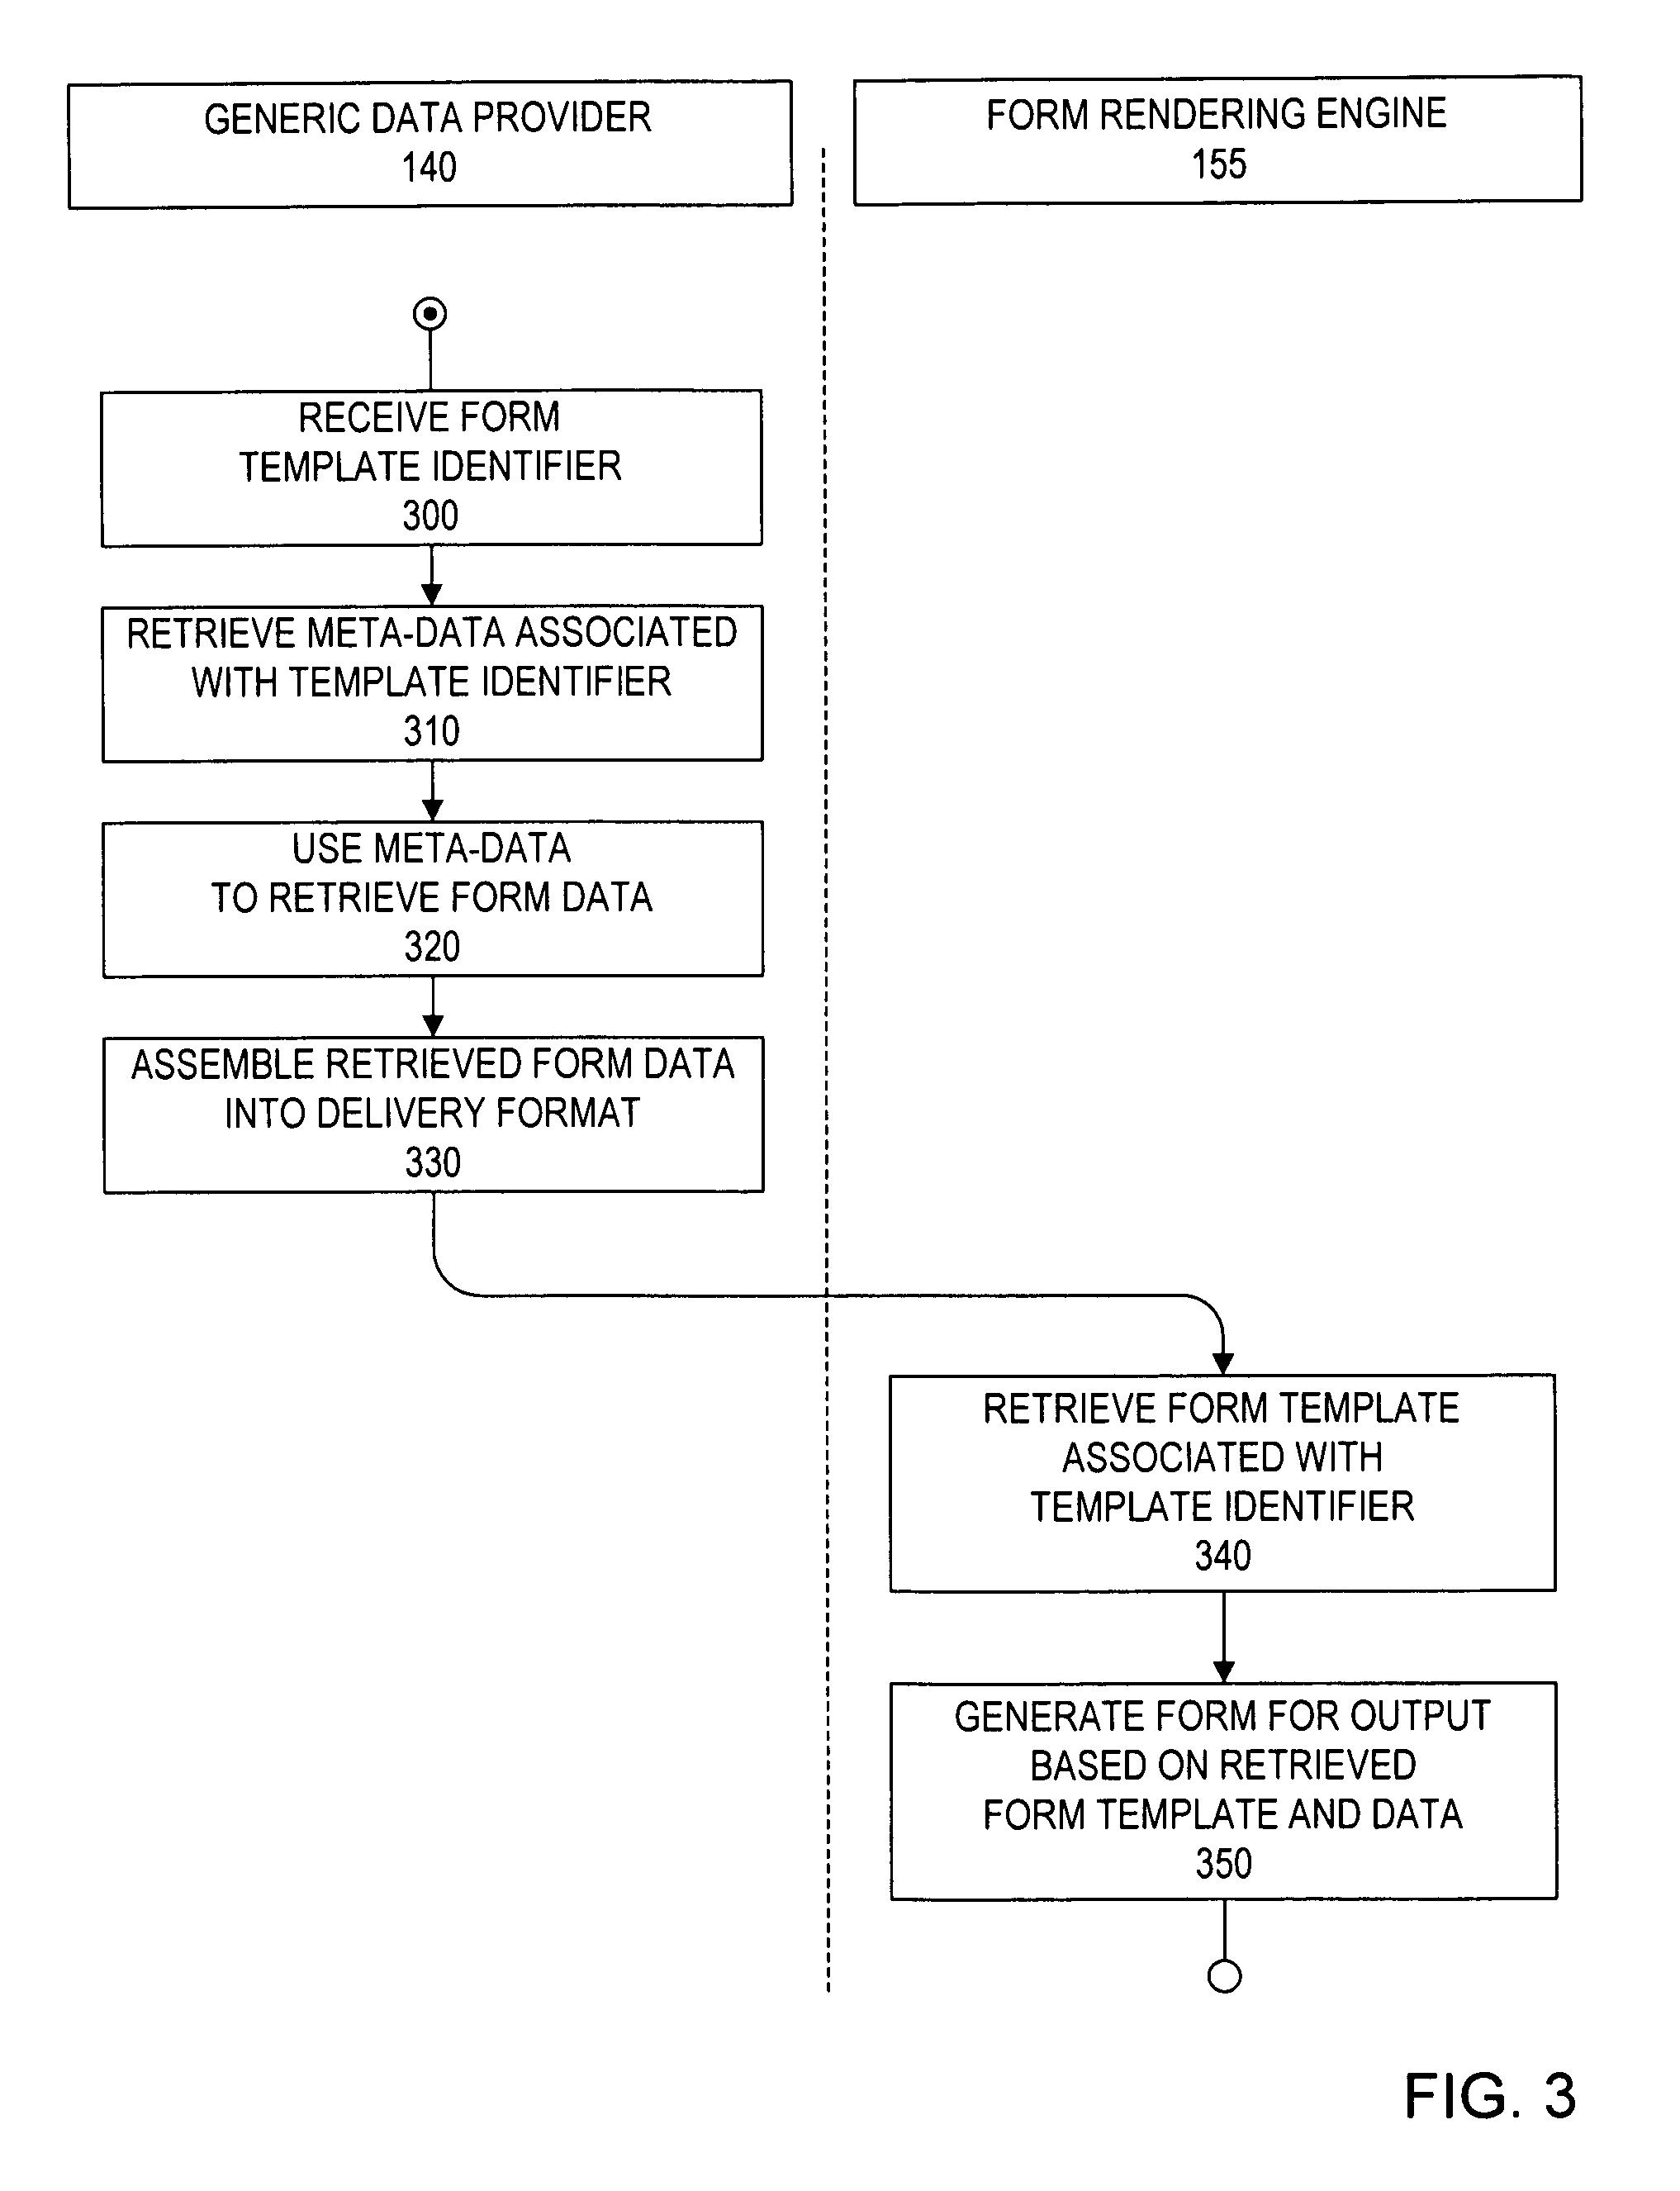 براءة الاختراع us20080154937 system and method for generic output